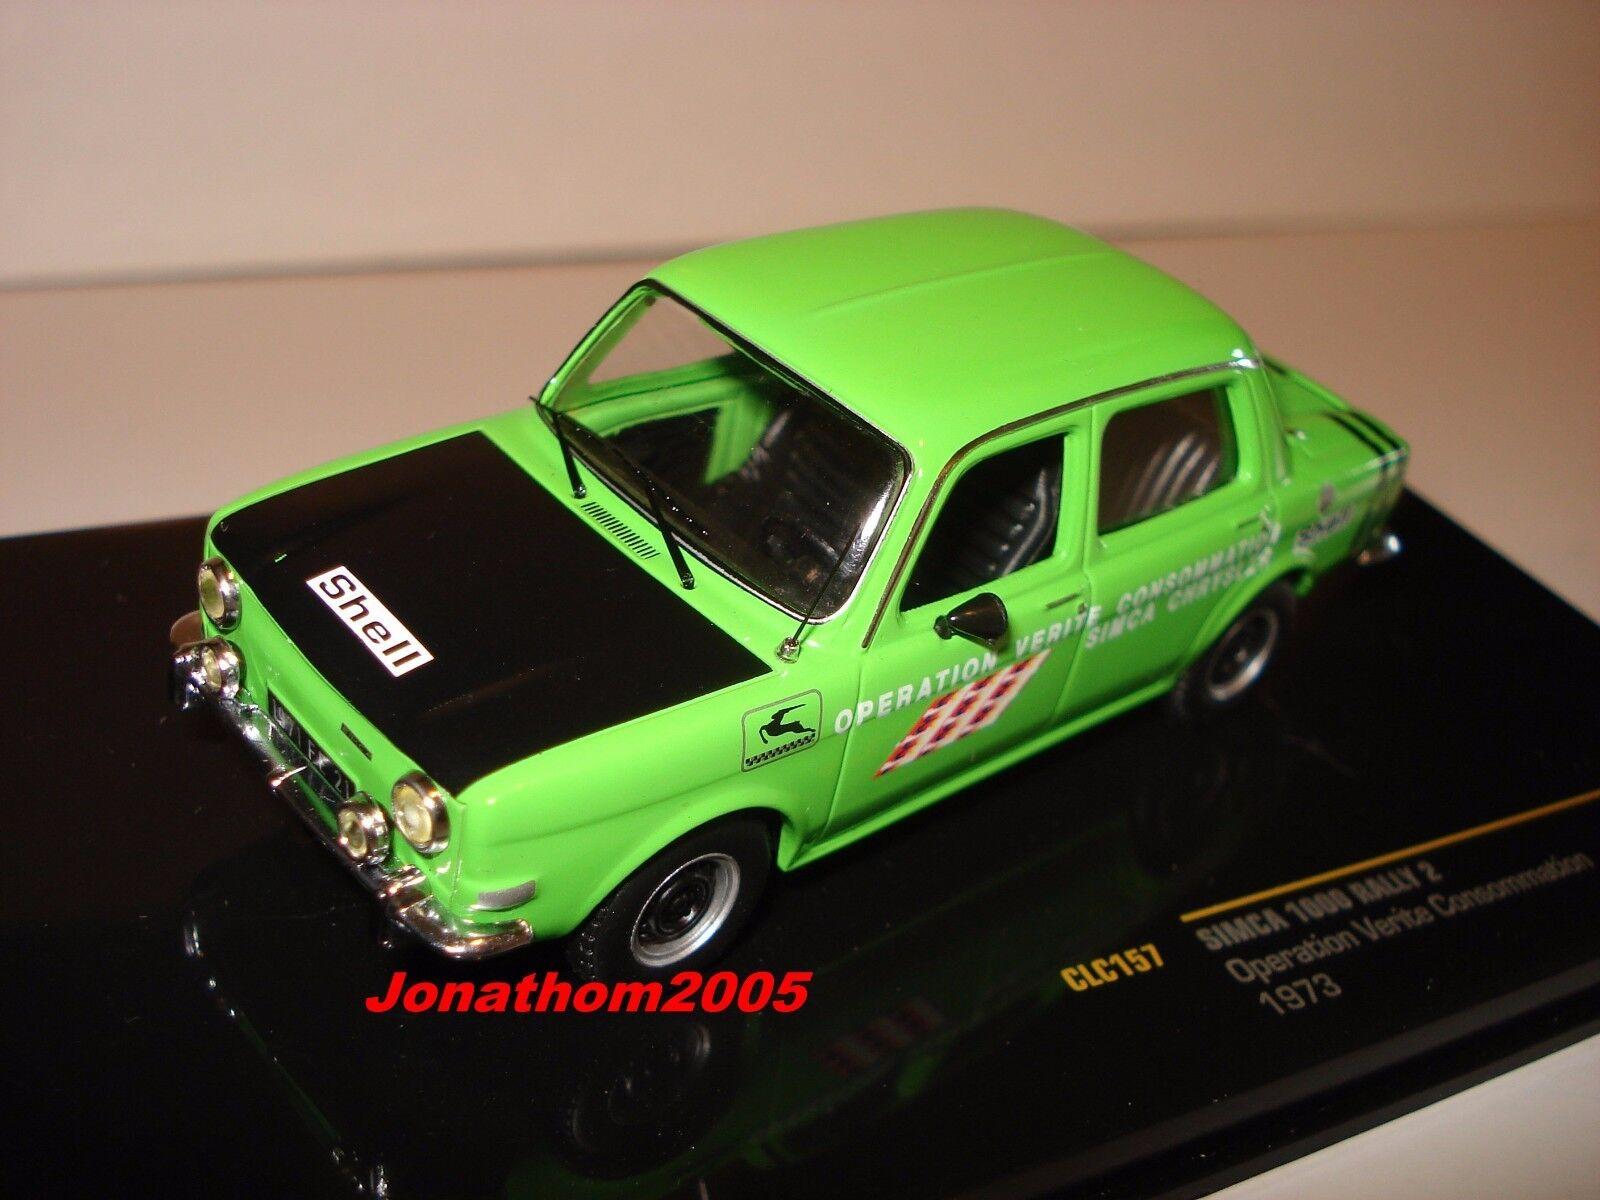 Ixo CLC157 Simca 1000 Rally 2 Operation Wahrheit Verbrauch grün 1973 au 1 43°    Modisch